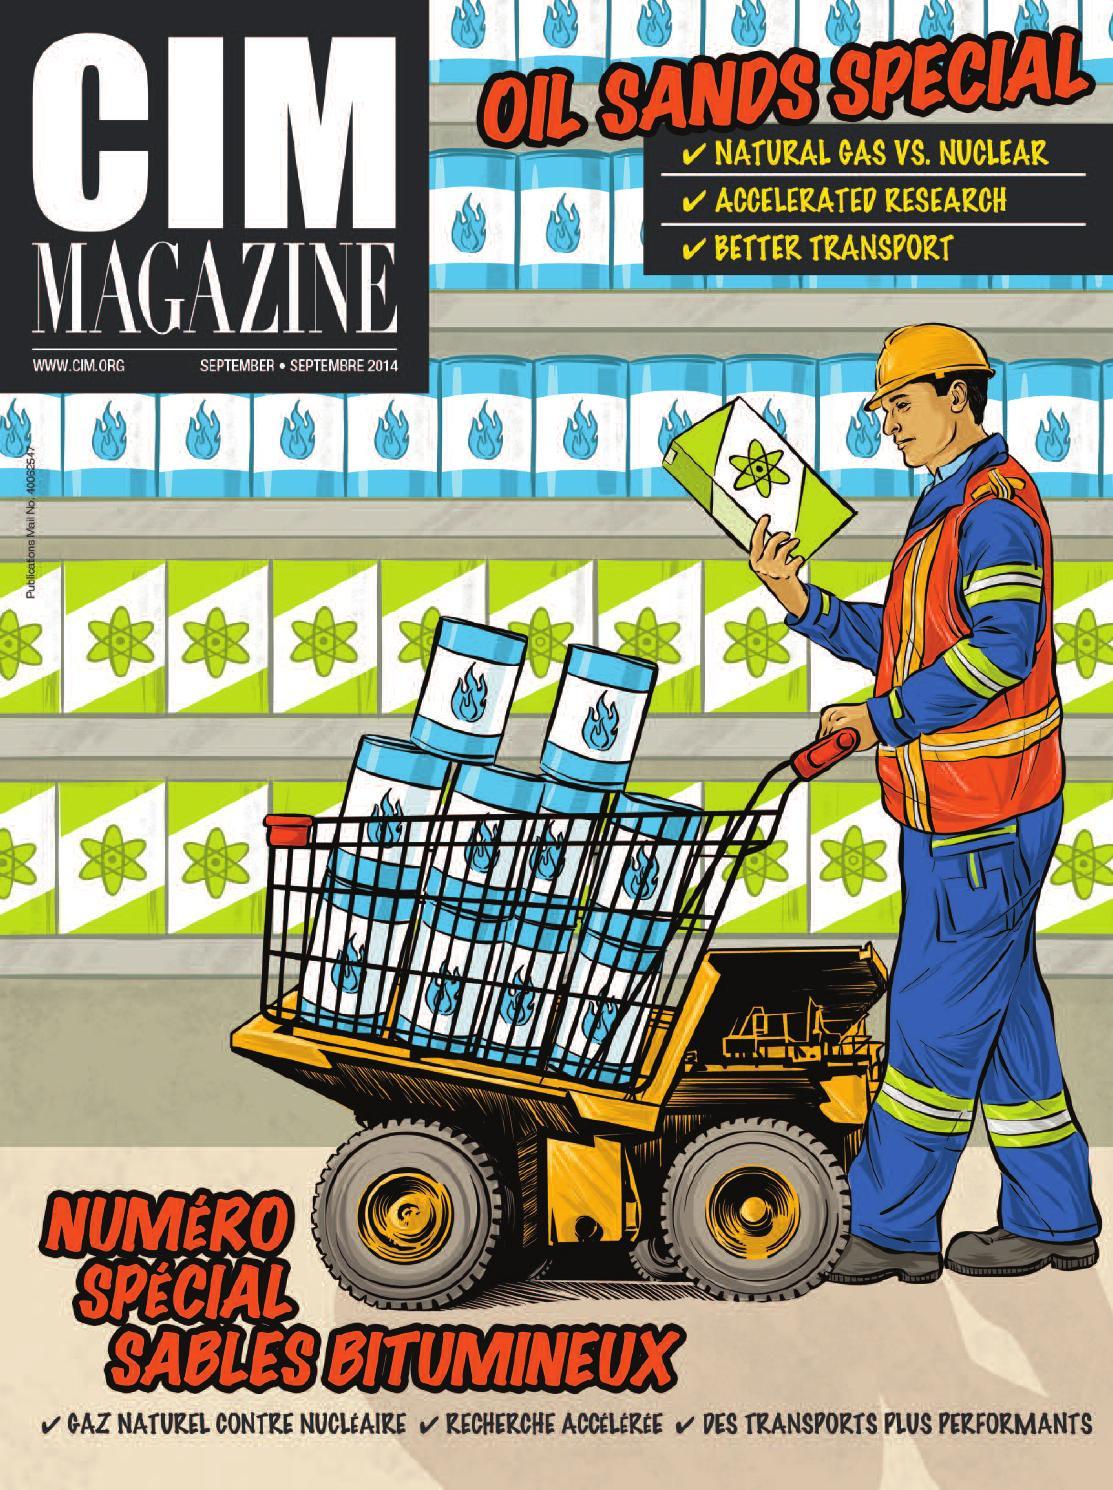 Cim Magazine September 2014 By Icm Publications Issuu Iron Man 2 Achat Vente Circuit De Voiture Dual L